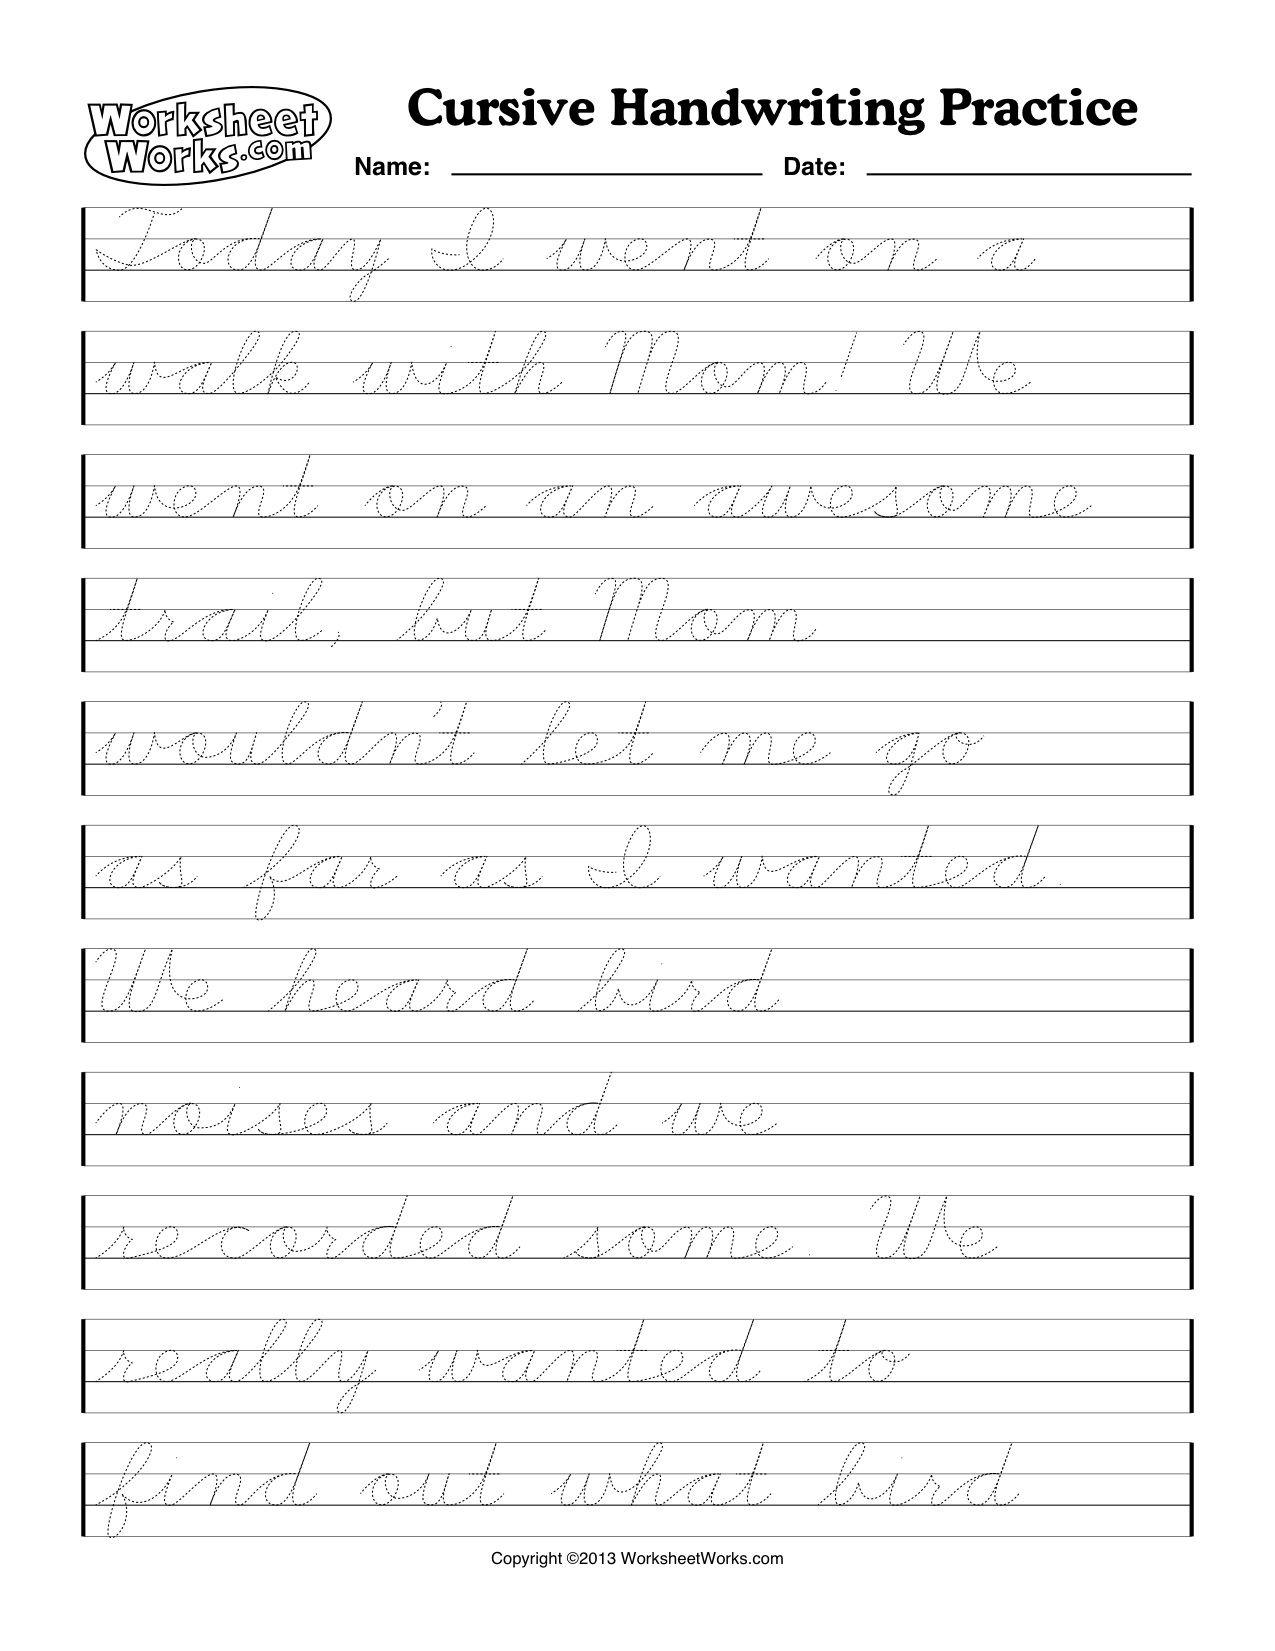 Cursive Handwriting Worksheets | Cursive Writing Worksheet intended for Name Tracing Cursive